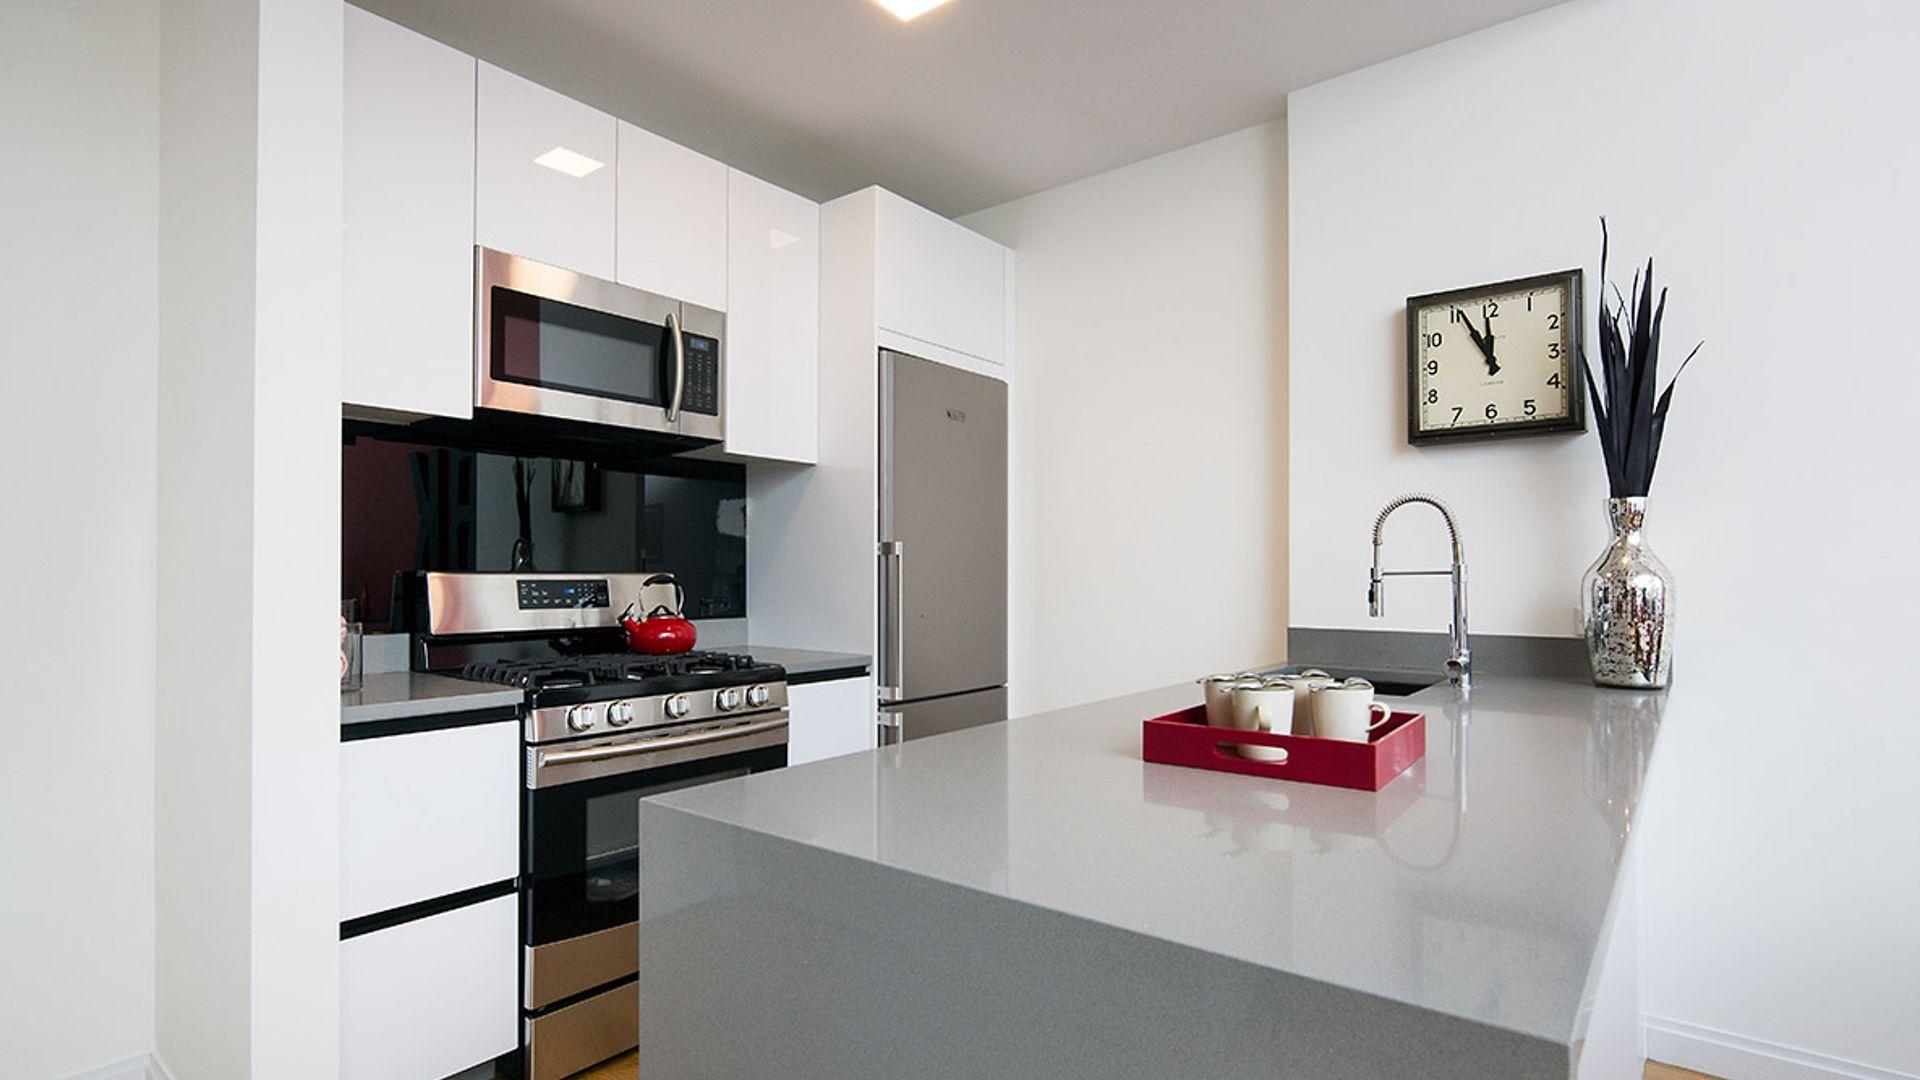 Atelier apartments in williamsburg 239 north 9th street - 1 bedroom apartments williamsburg brooklyn ...